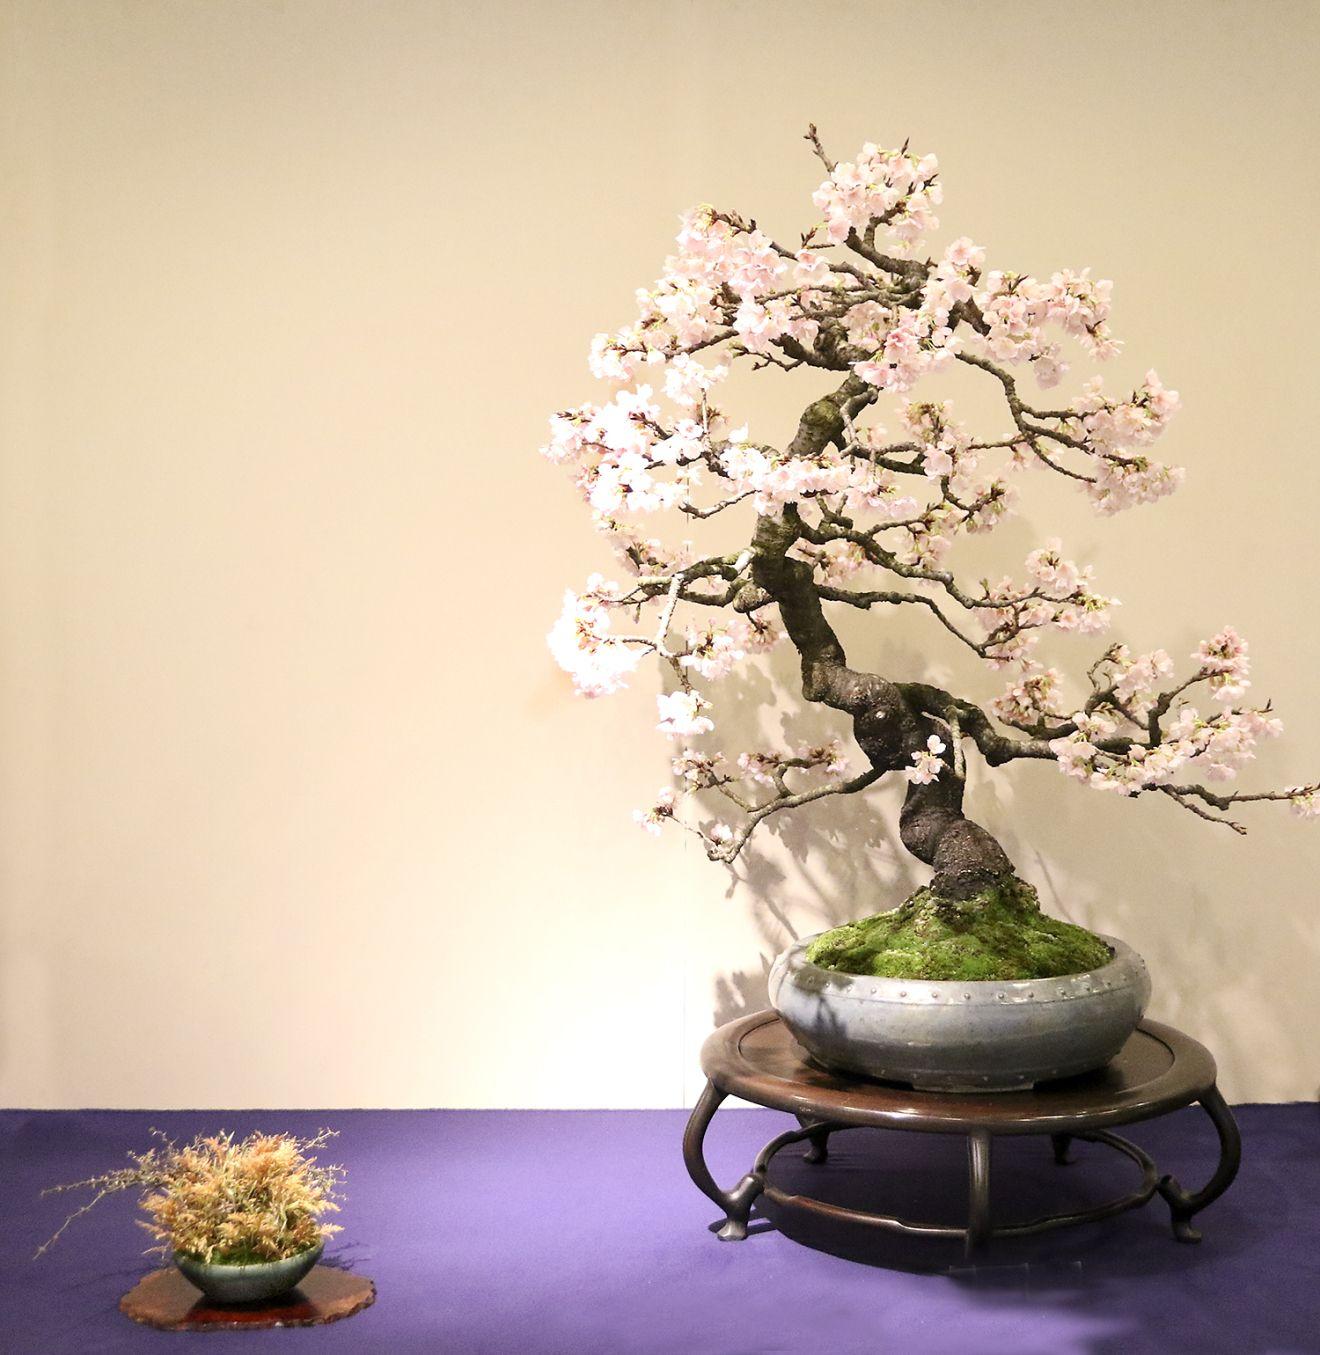 Using Accessory Plantings For Displaying Bonsai Bonsai Plants Bonsai Techniques